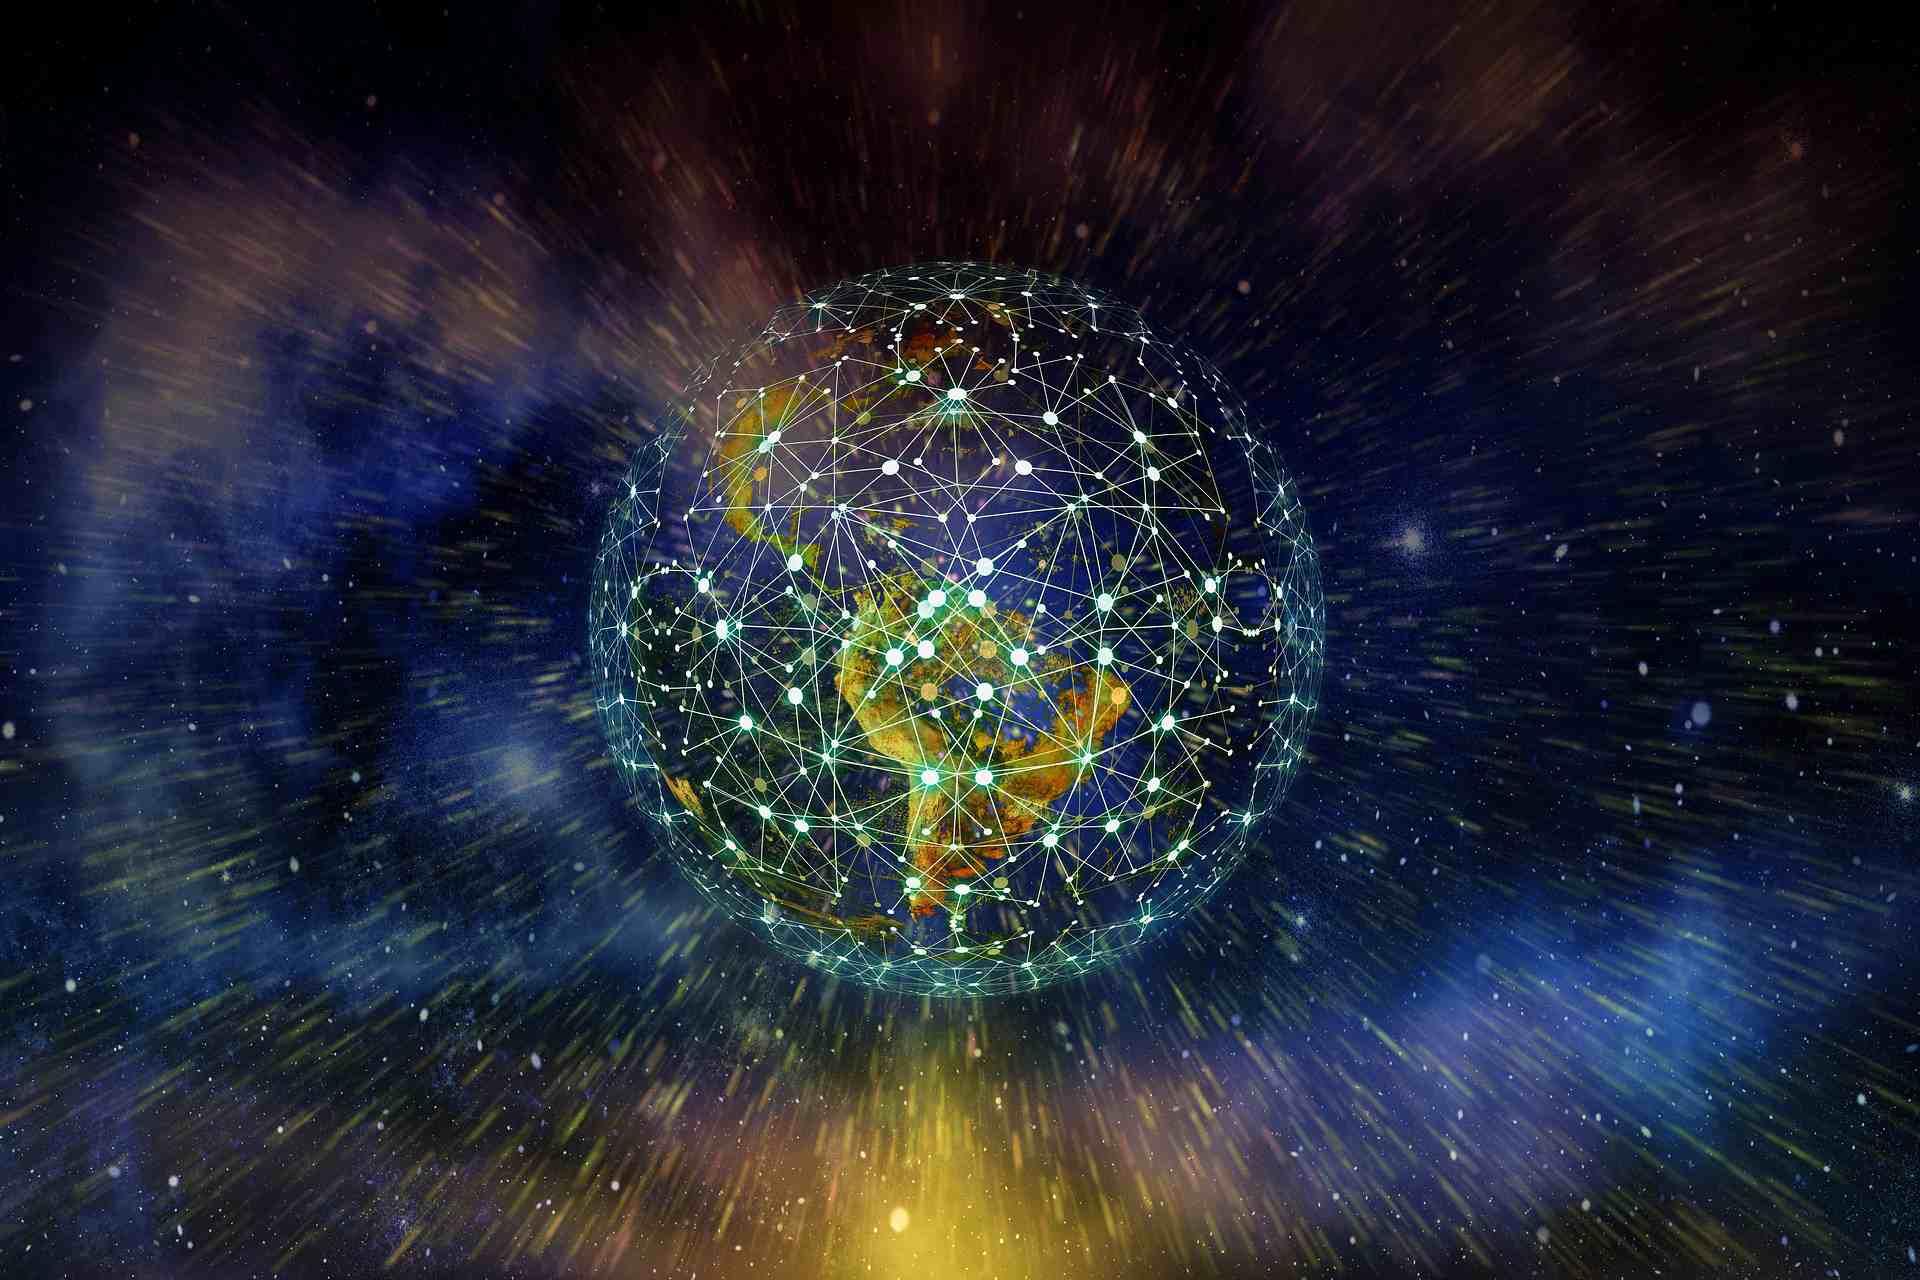 Illustration of a global network